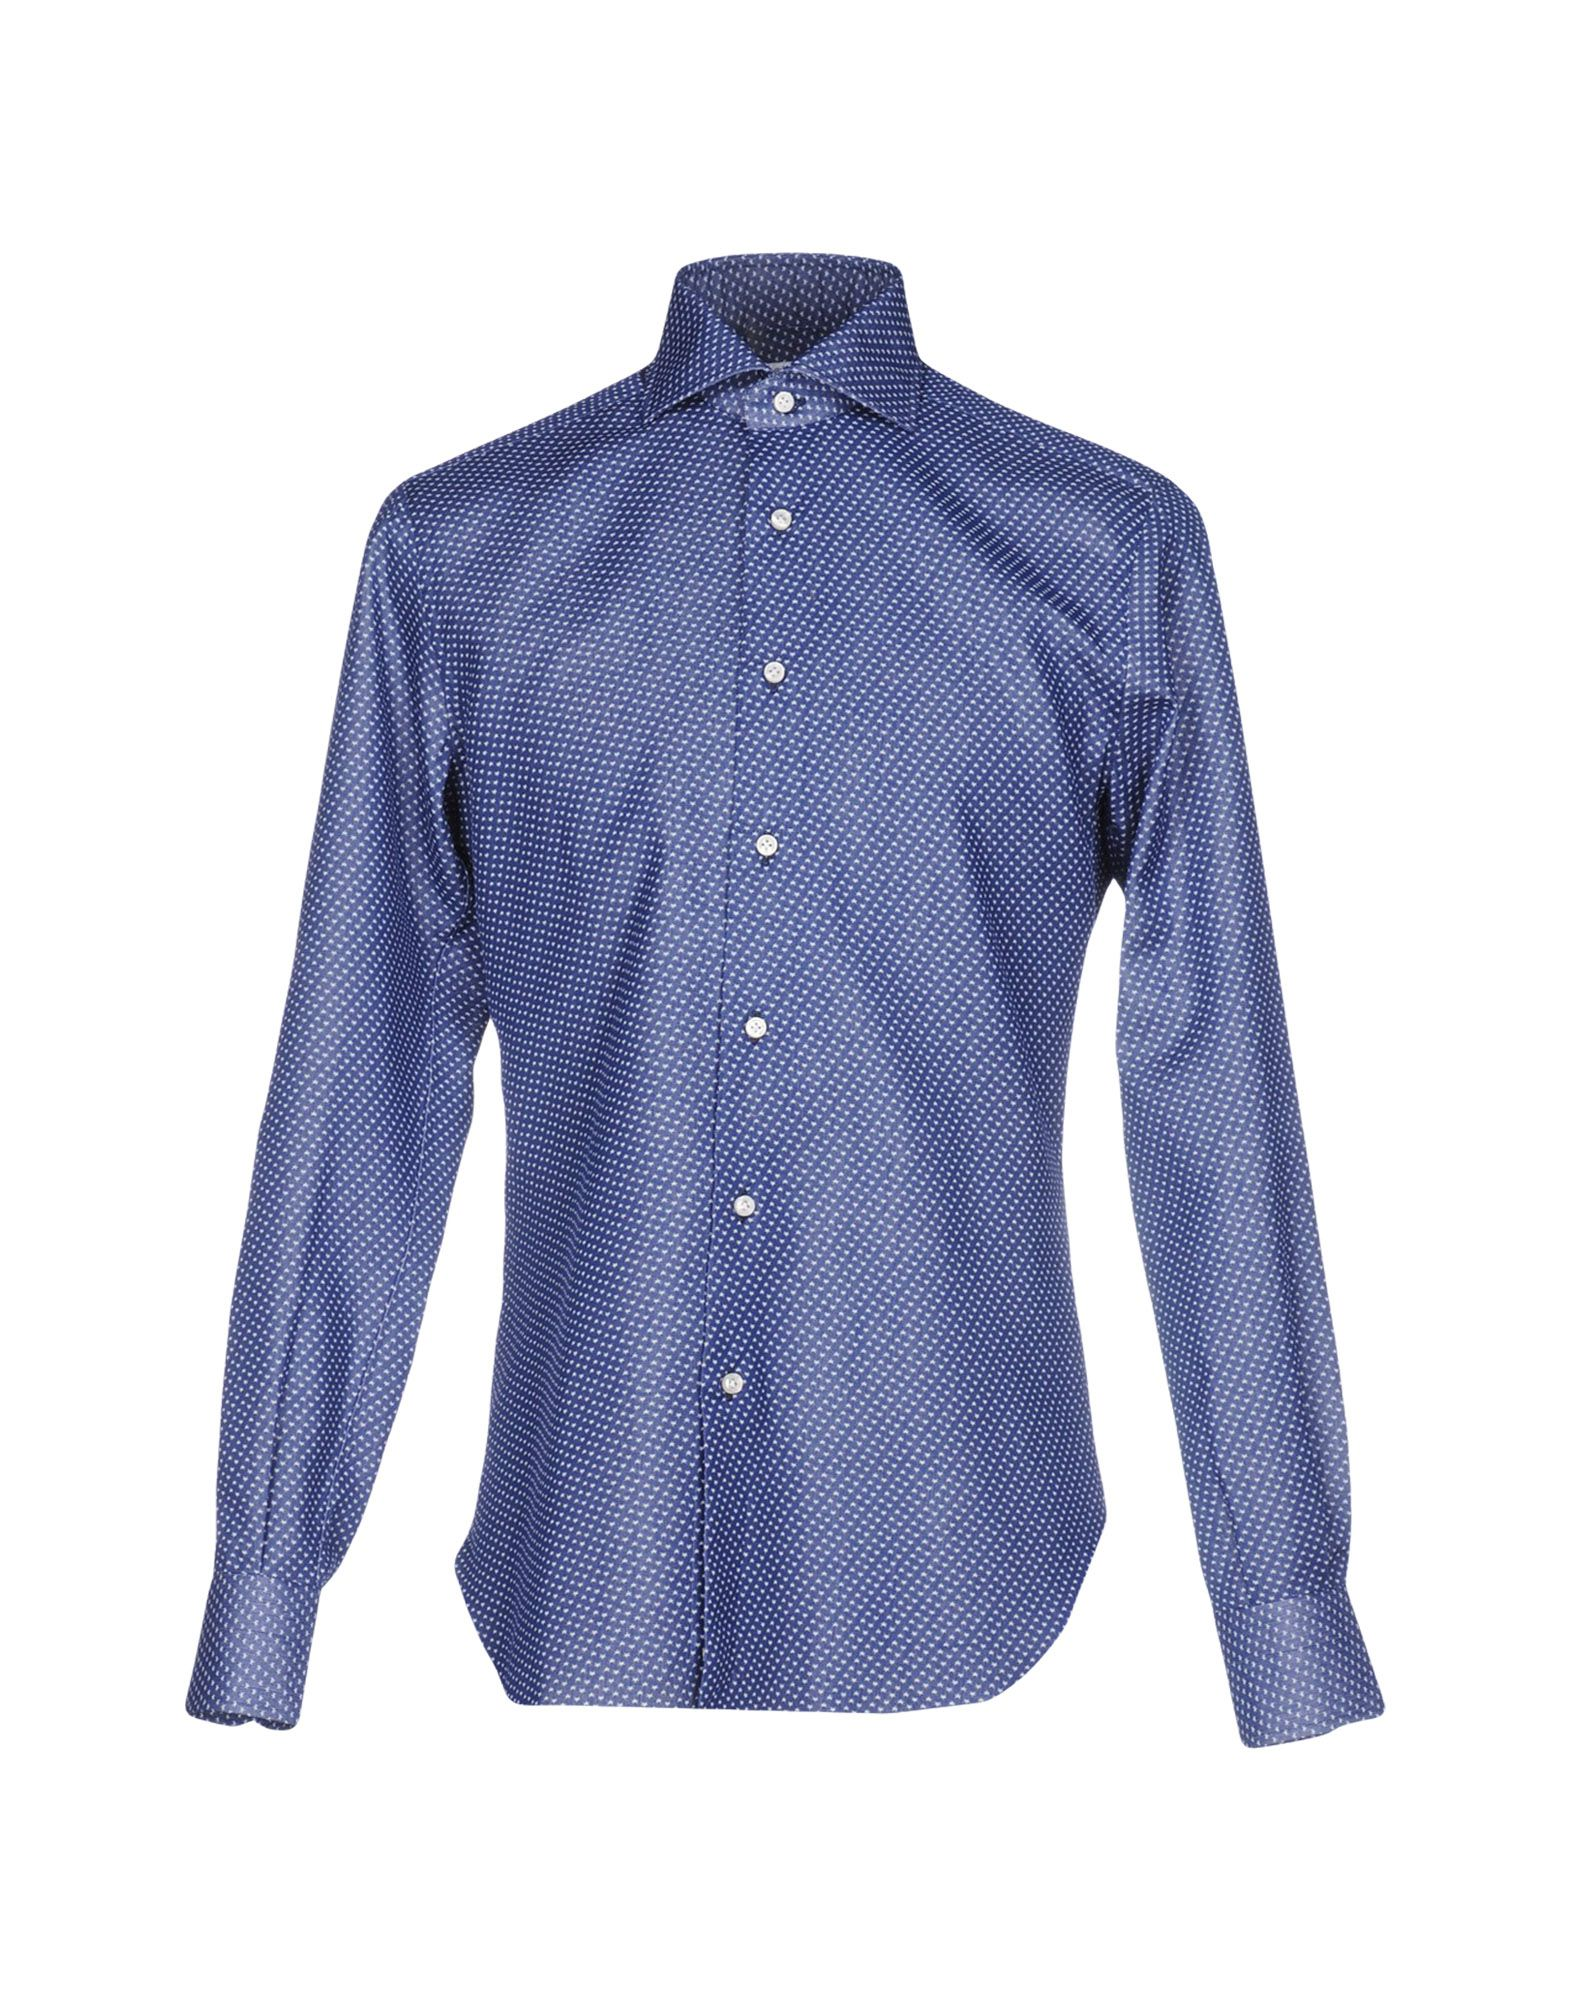 MICHI D'AMATO Pубашка michi футболка